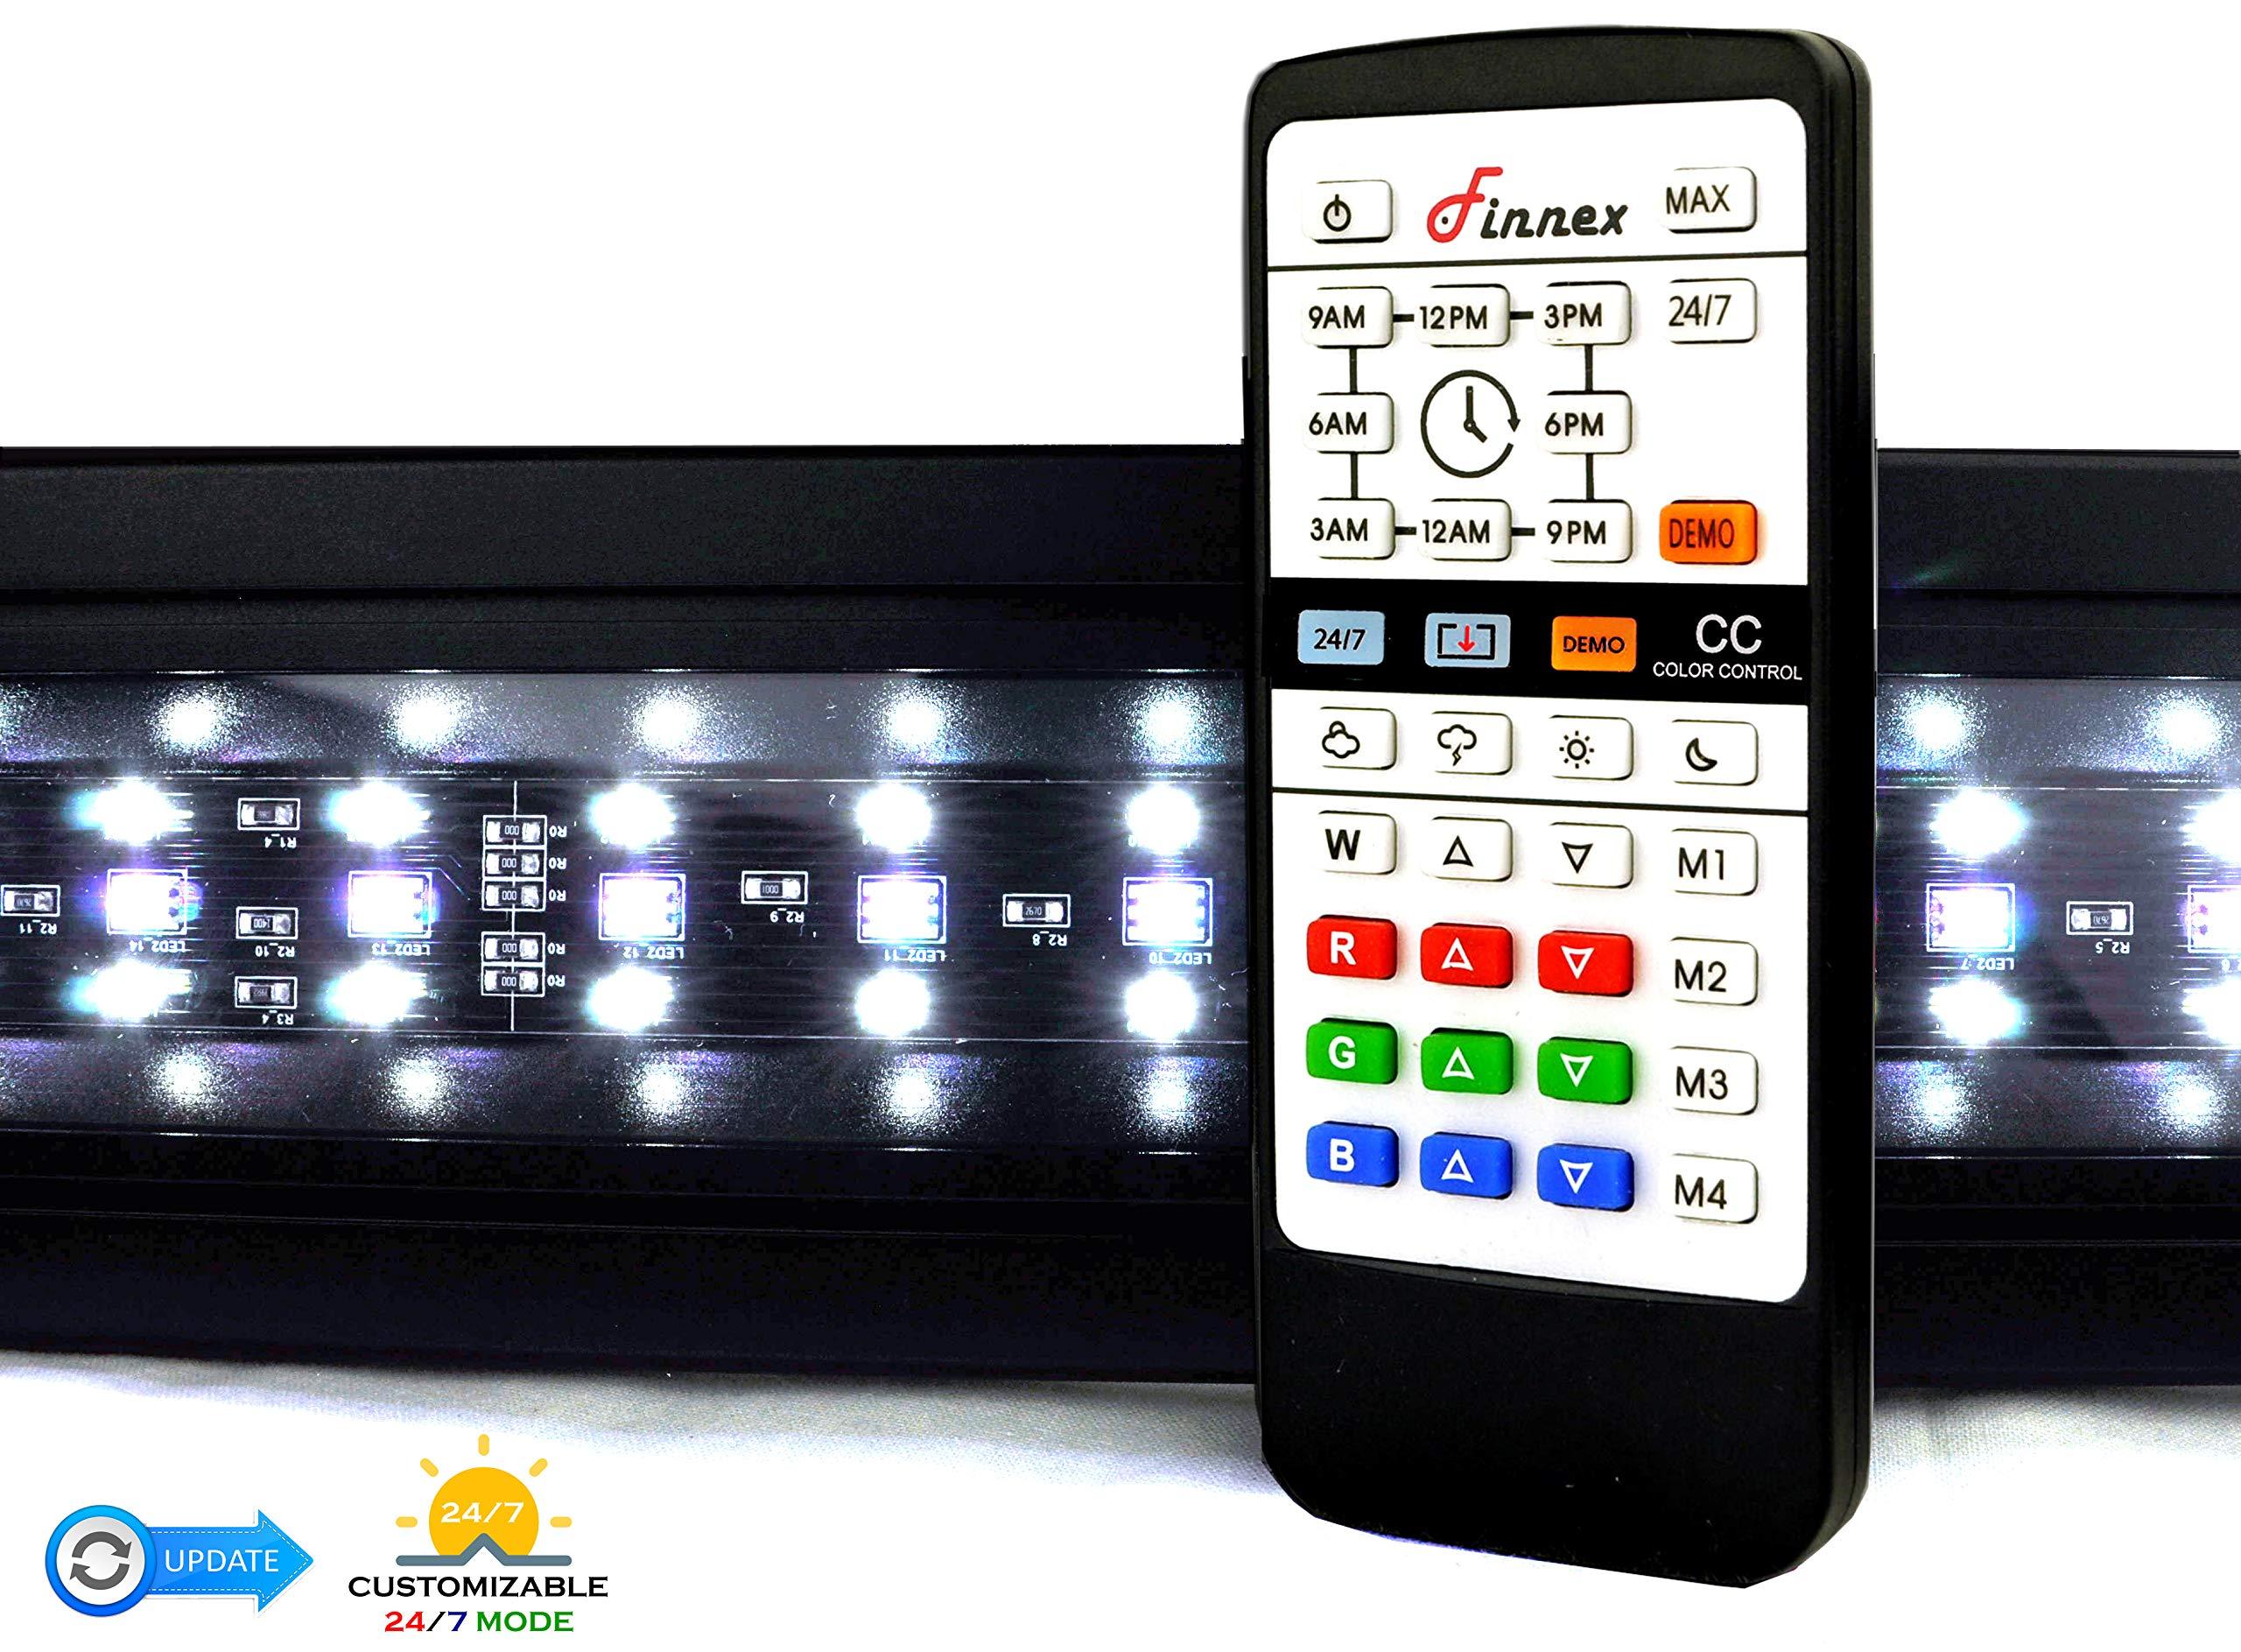 Finnex Planted+ 24/7 LED Klc Aquarium LED Light, Automated Full Spectrum Fish Tank Light, 46.5-48'' by Finnex